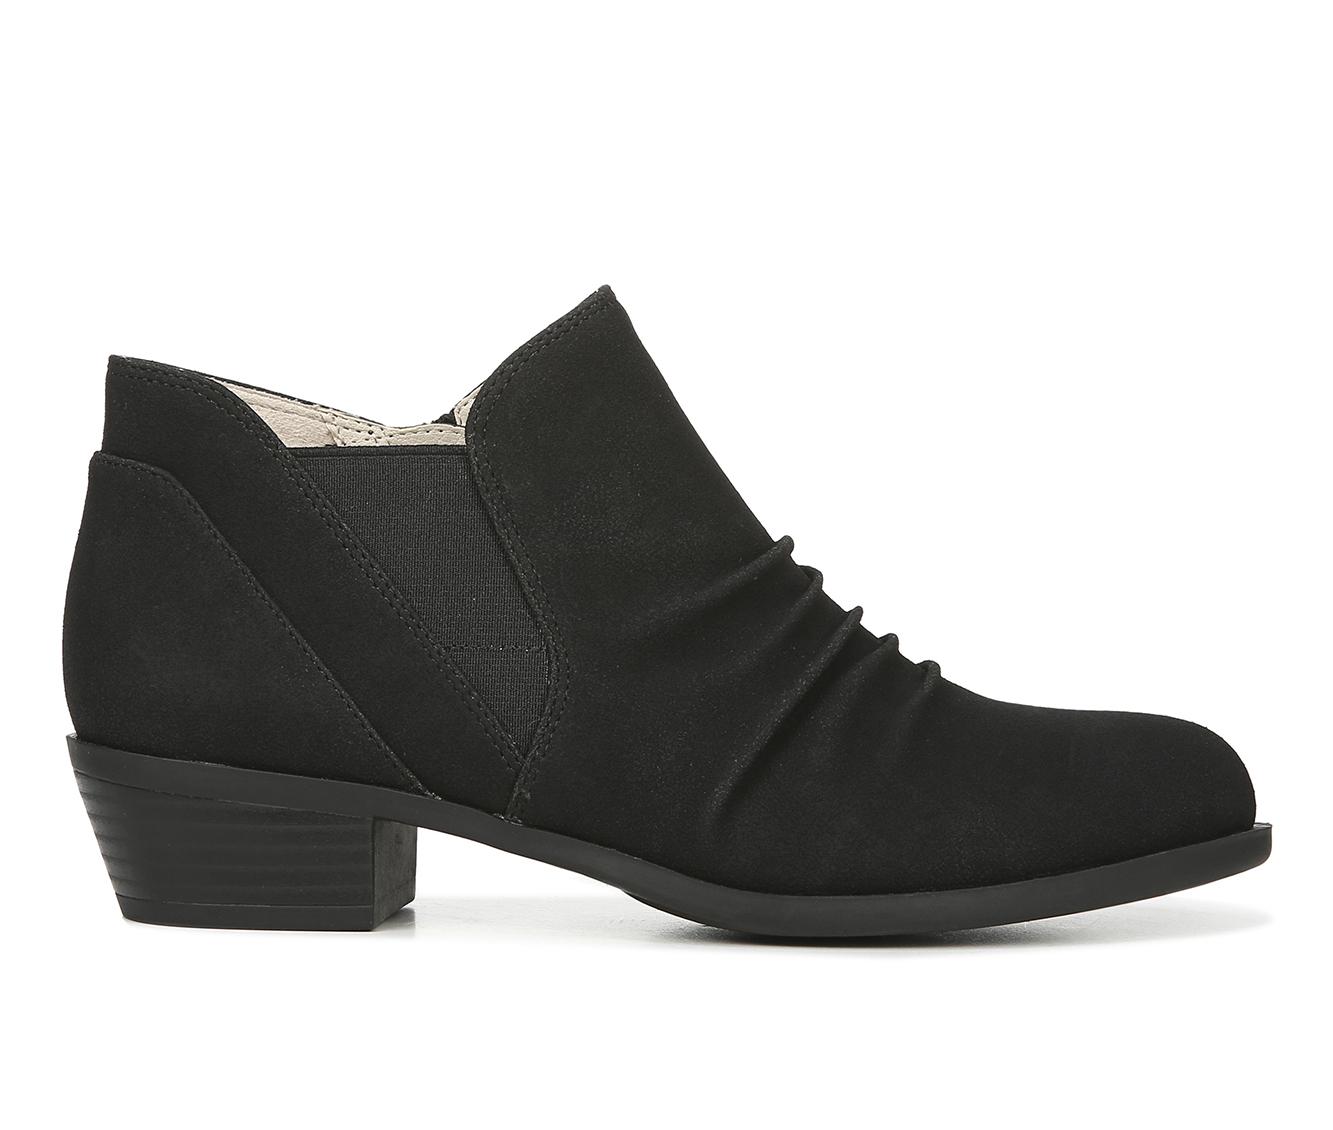 LifeStride Aurora Women's Boot (Black Faux Leather)